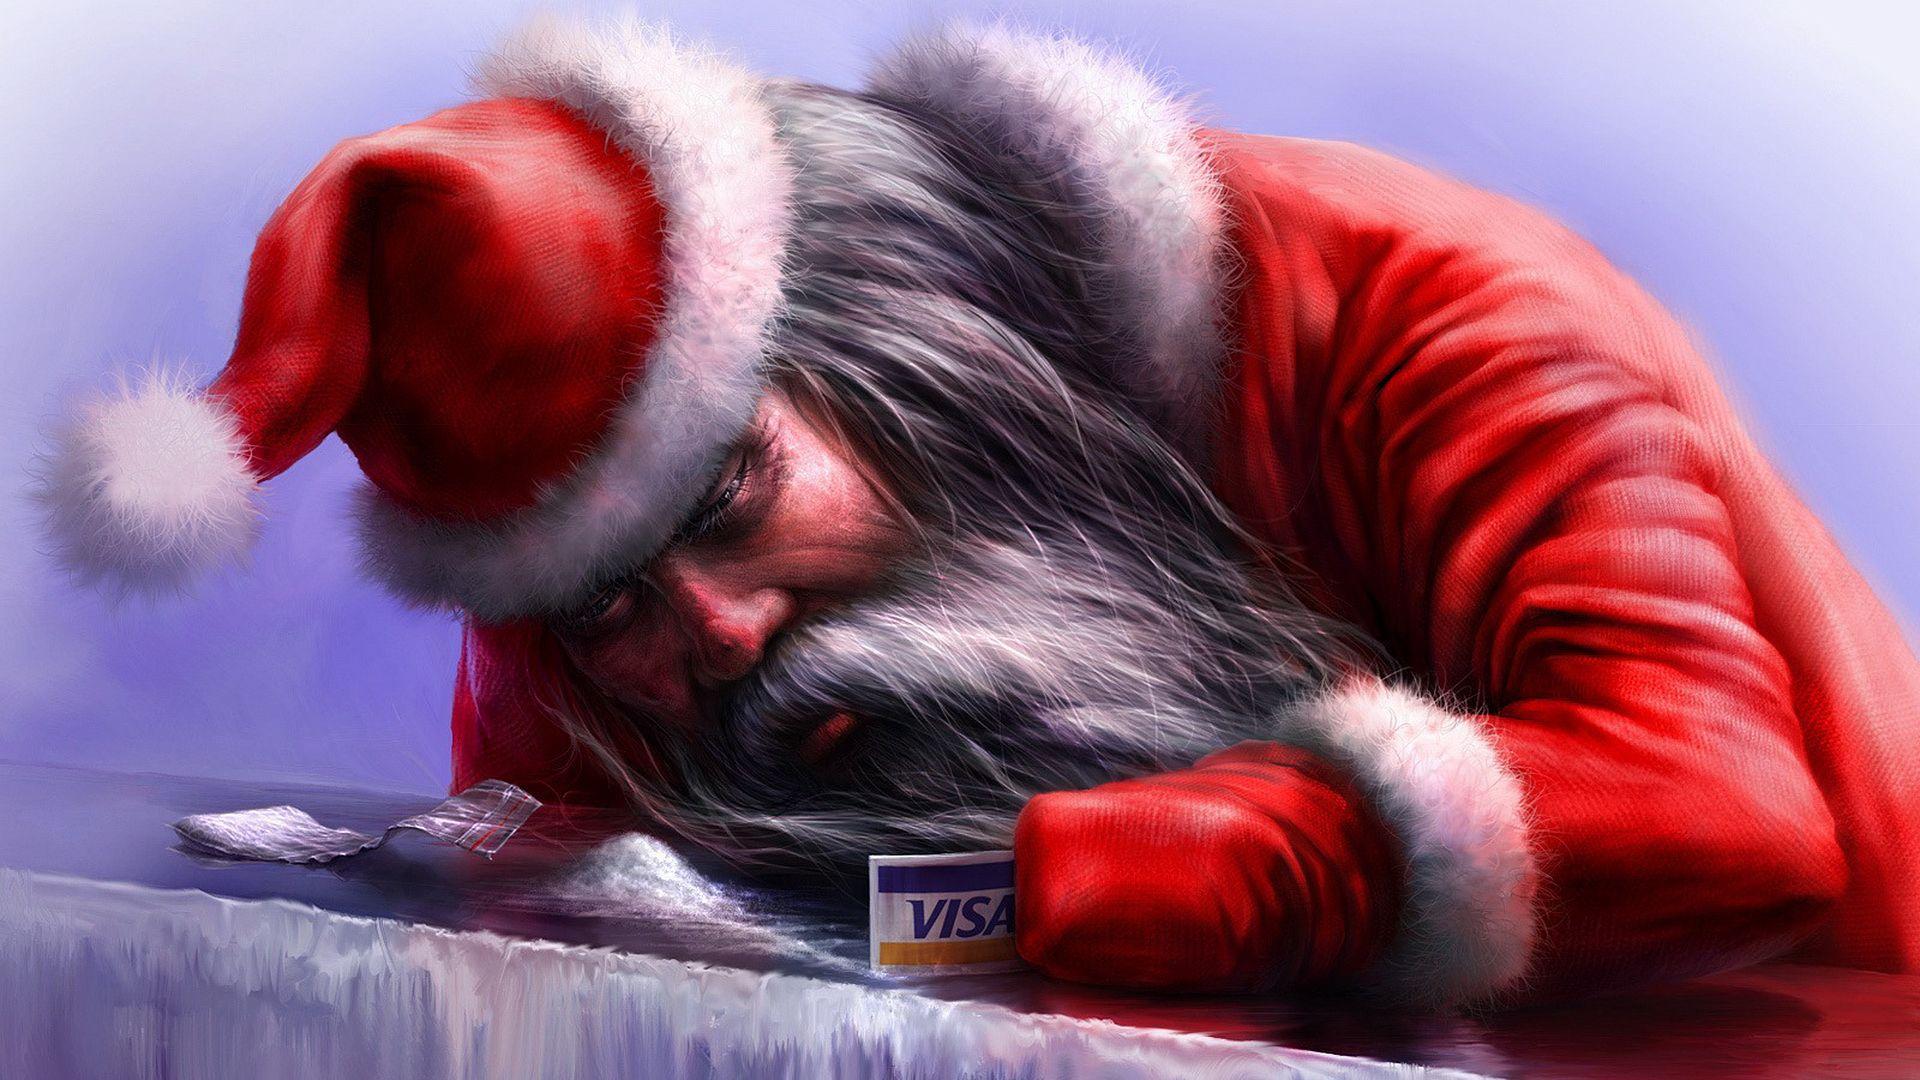 Santa Claus vertical wallpaper hd